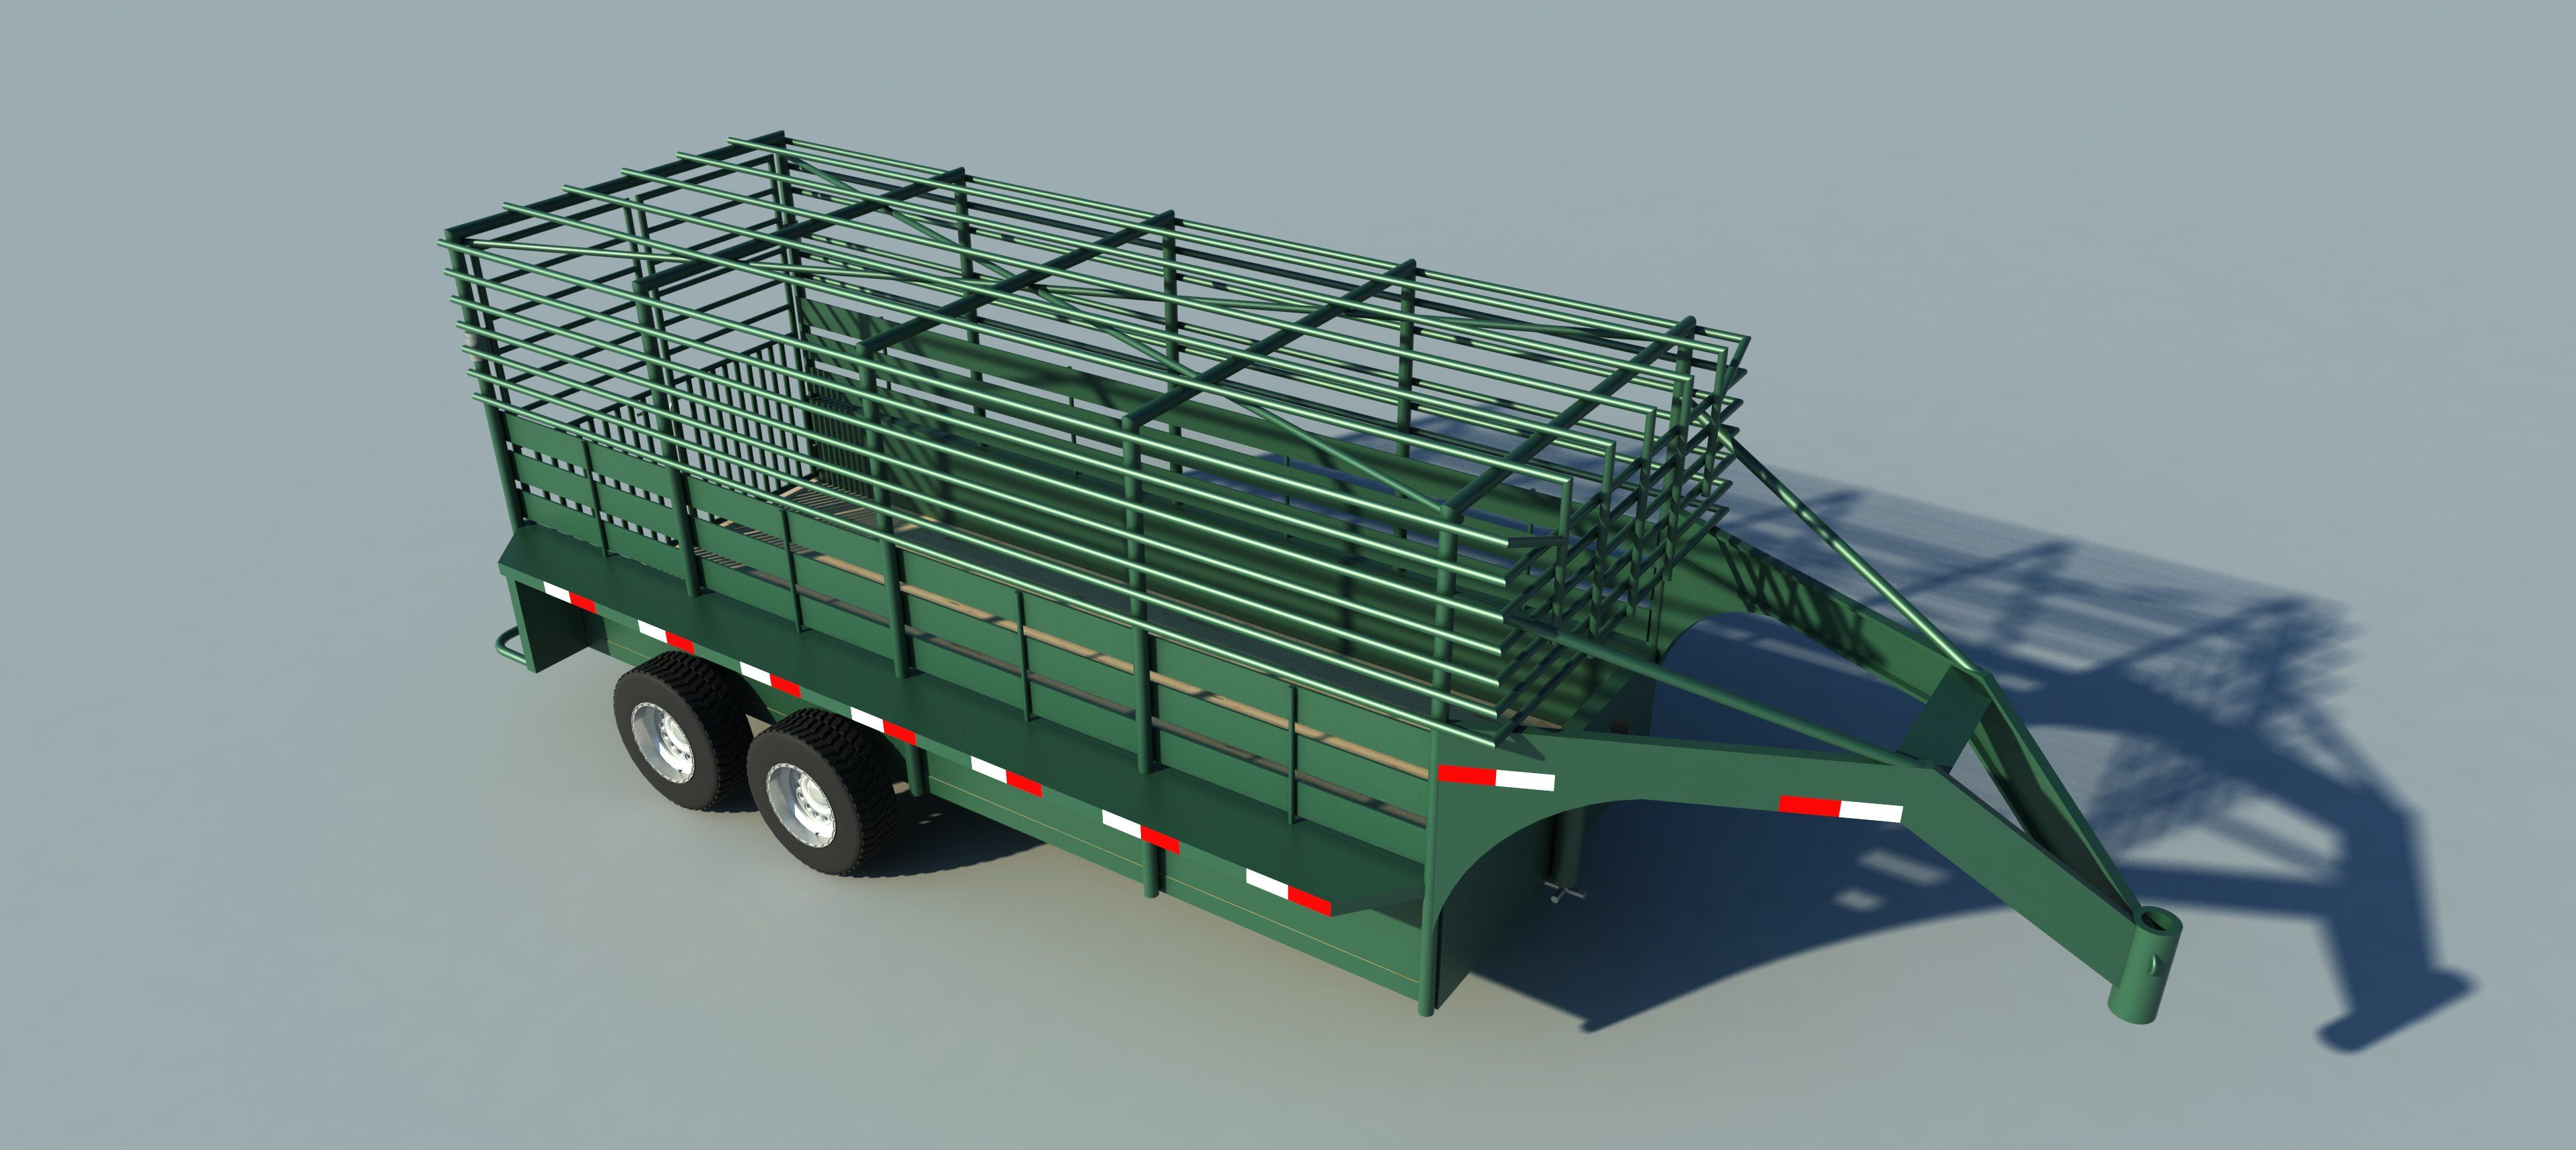 Build your own 16 gooseneck trailer diy plans fun to build save